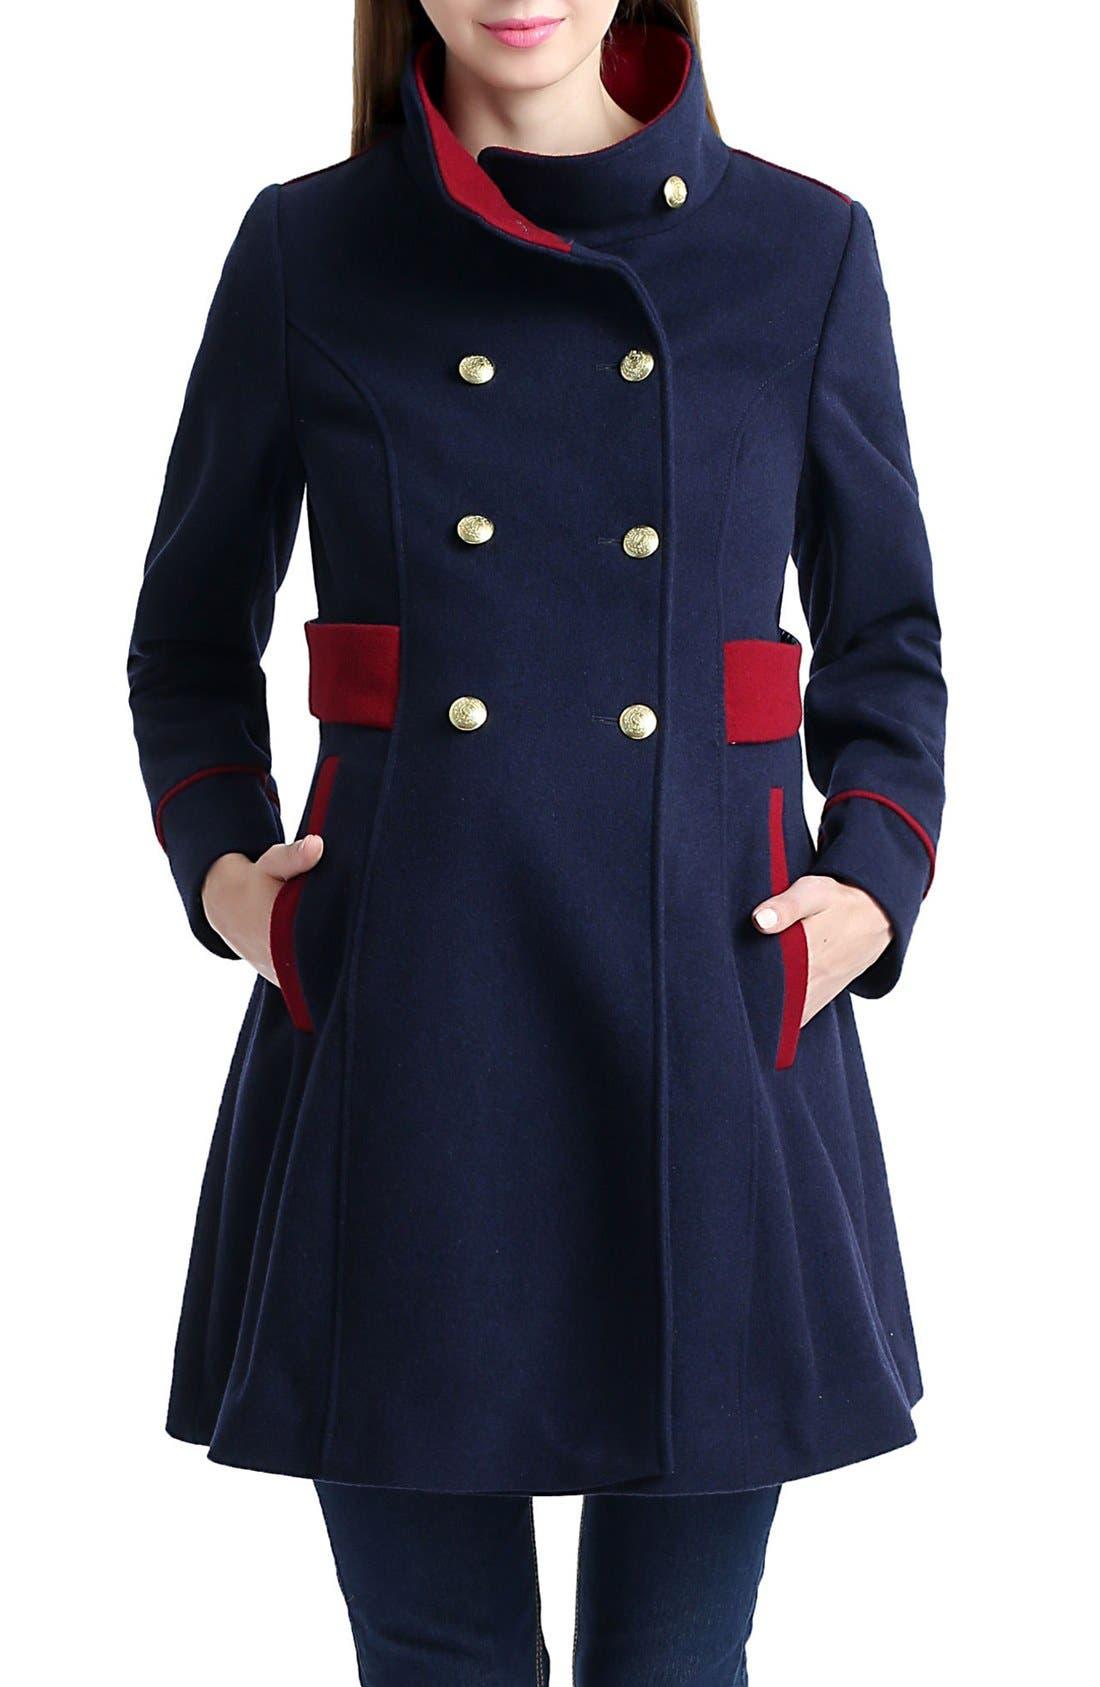 Nom 'Pan' Military Maternity Pea Coat,                             Main thumbnail 1, color,                             NAVY